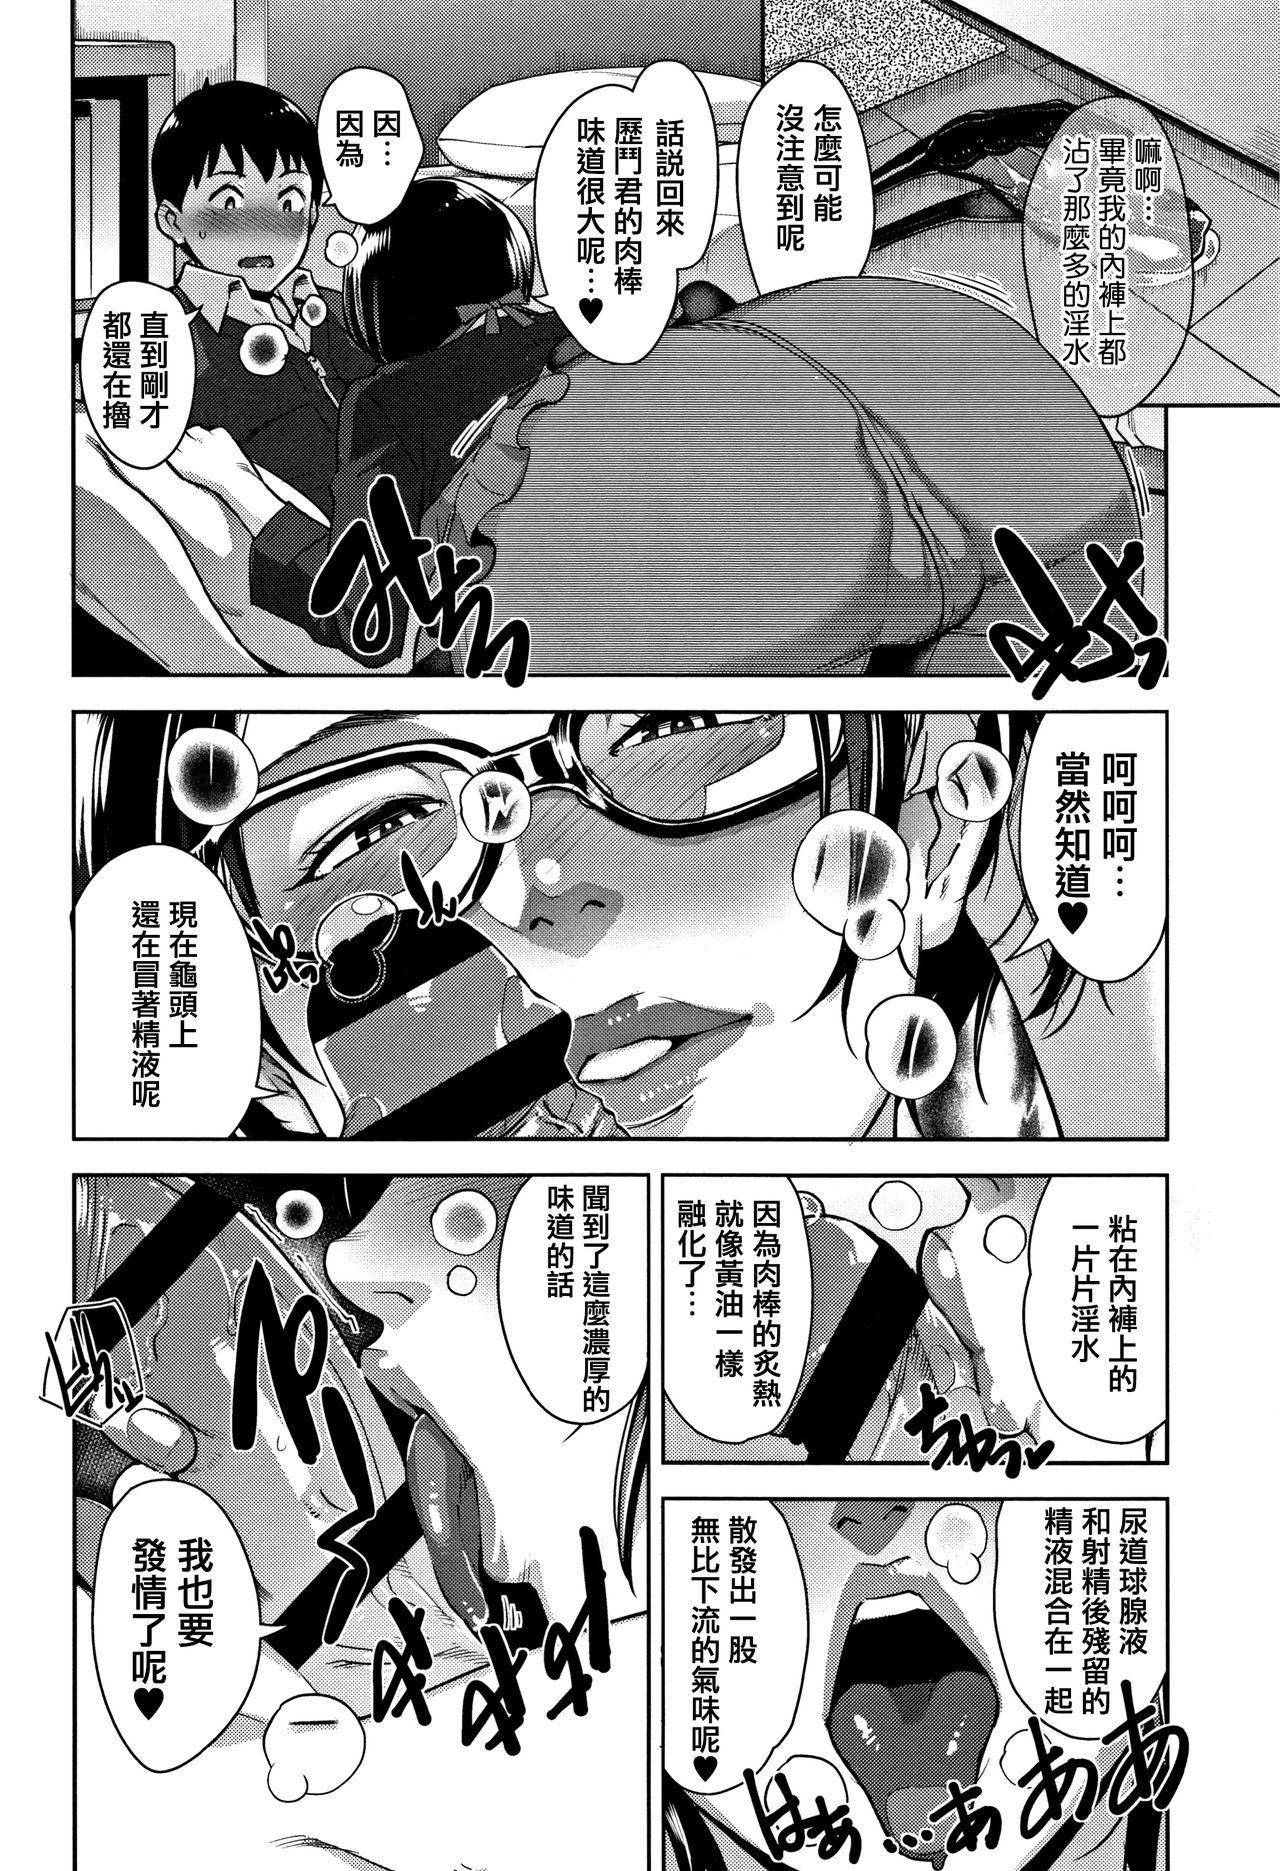 Kanjyuku Chijyo 53